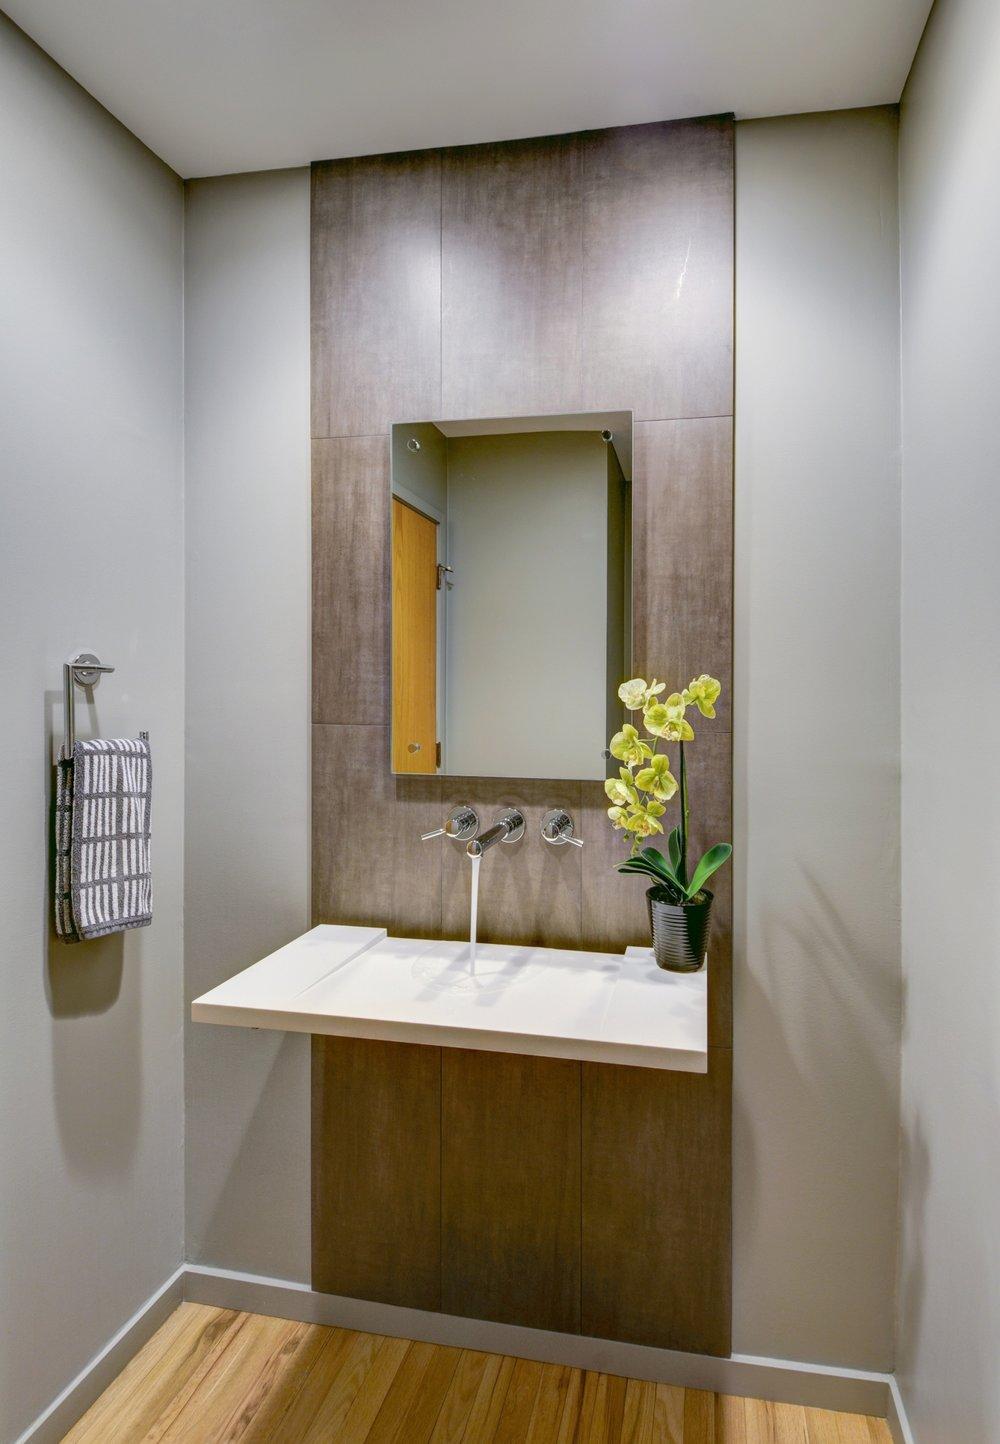 Bathrooms_19.jpg